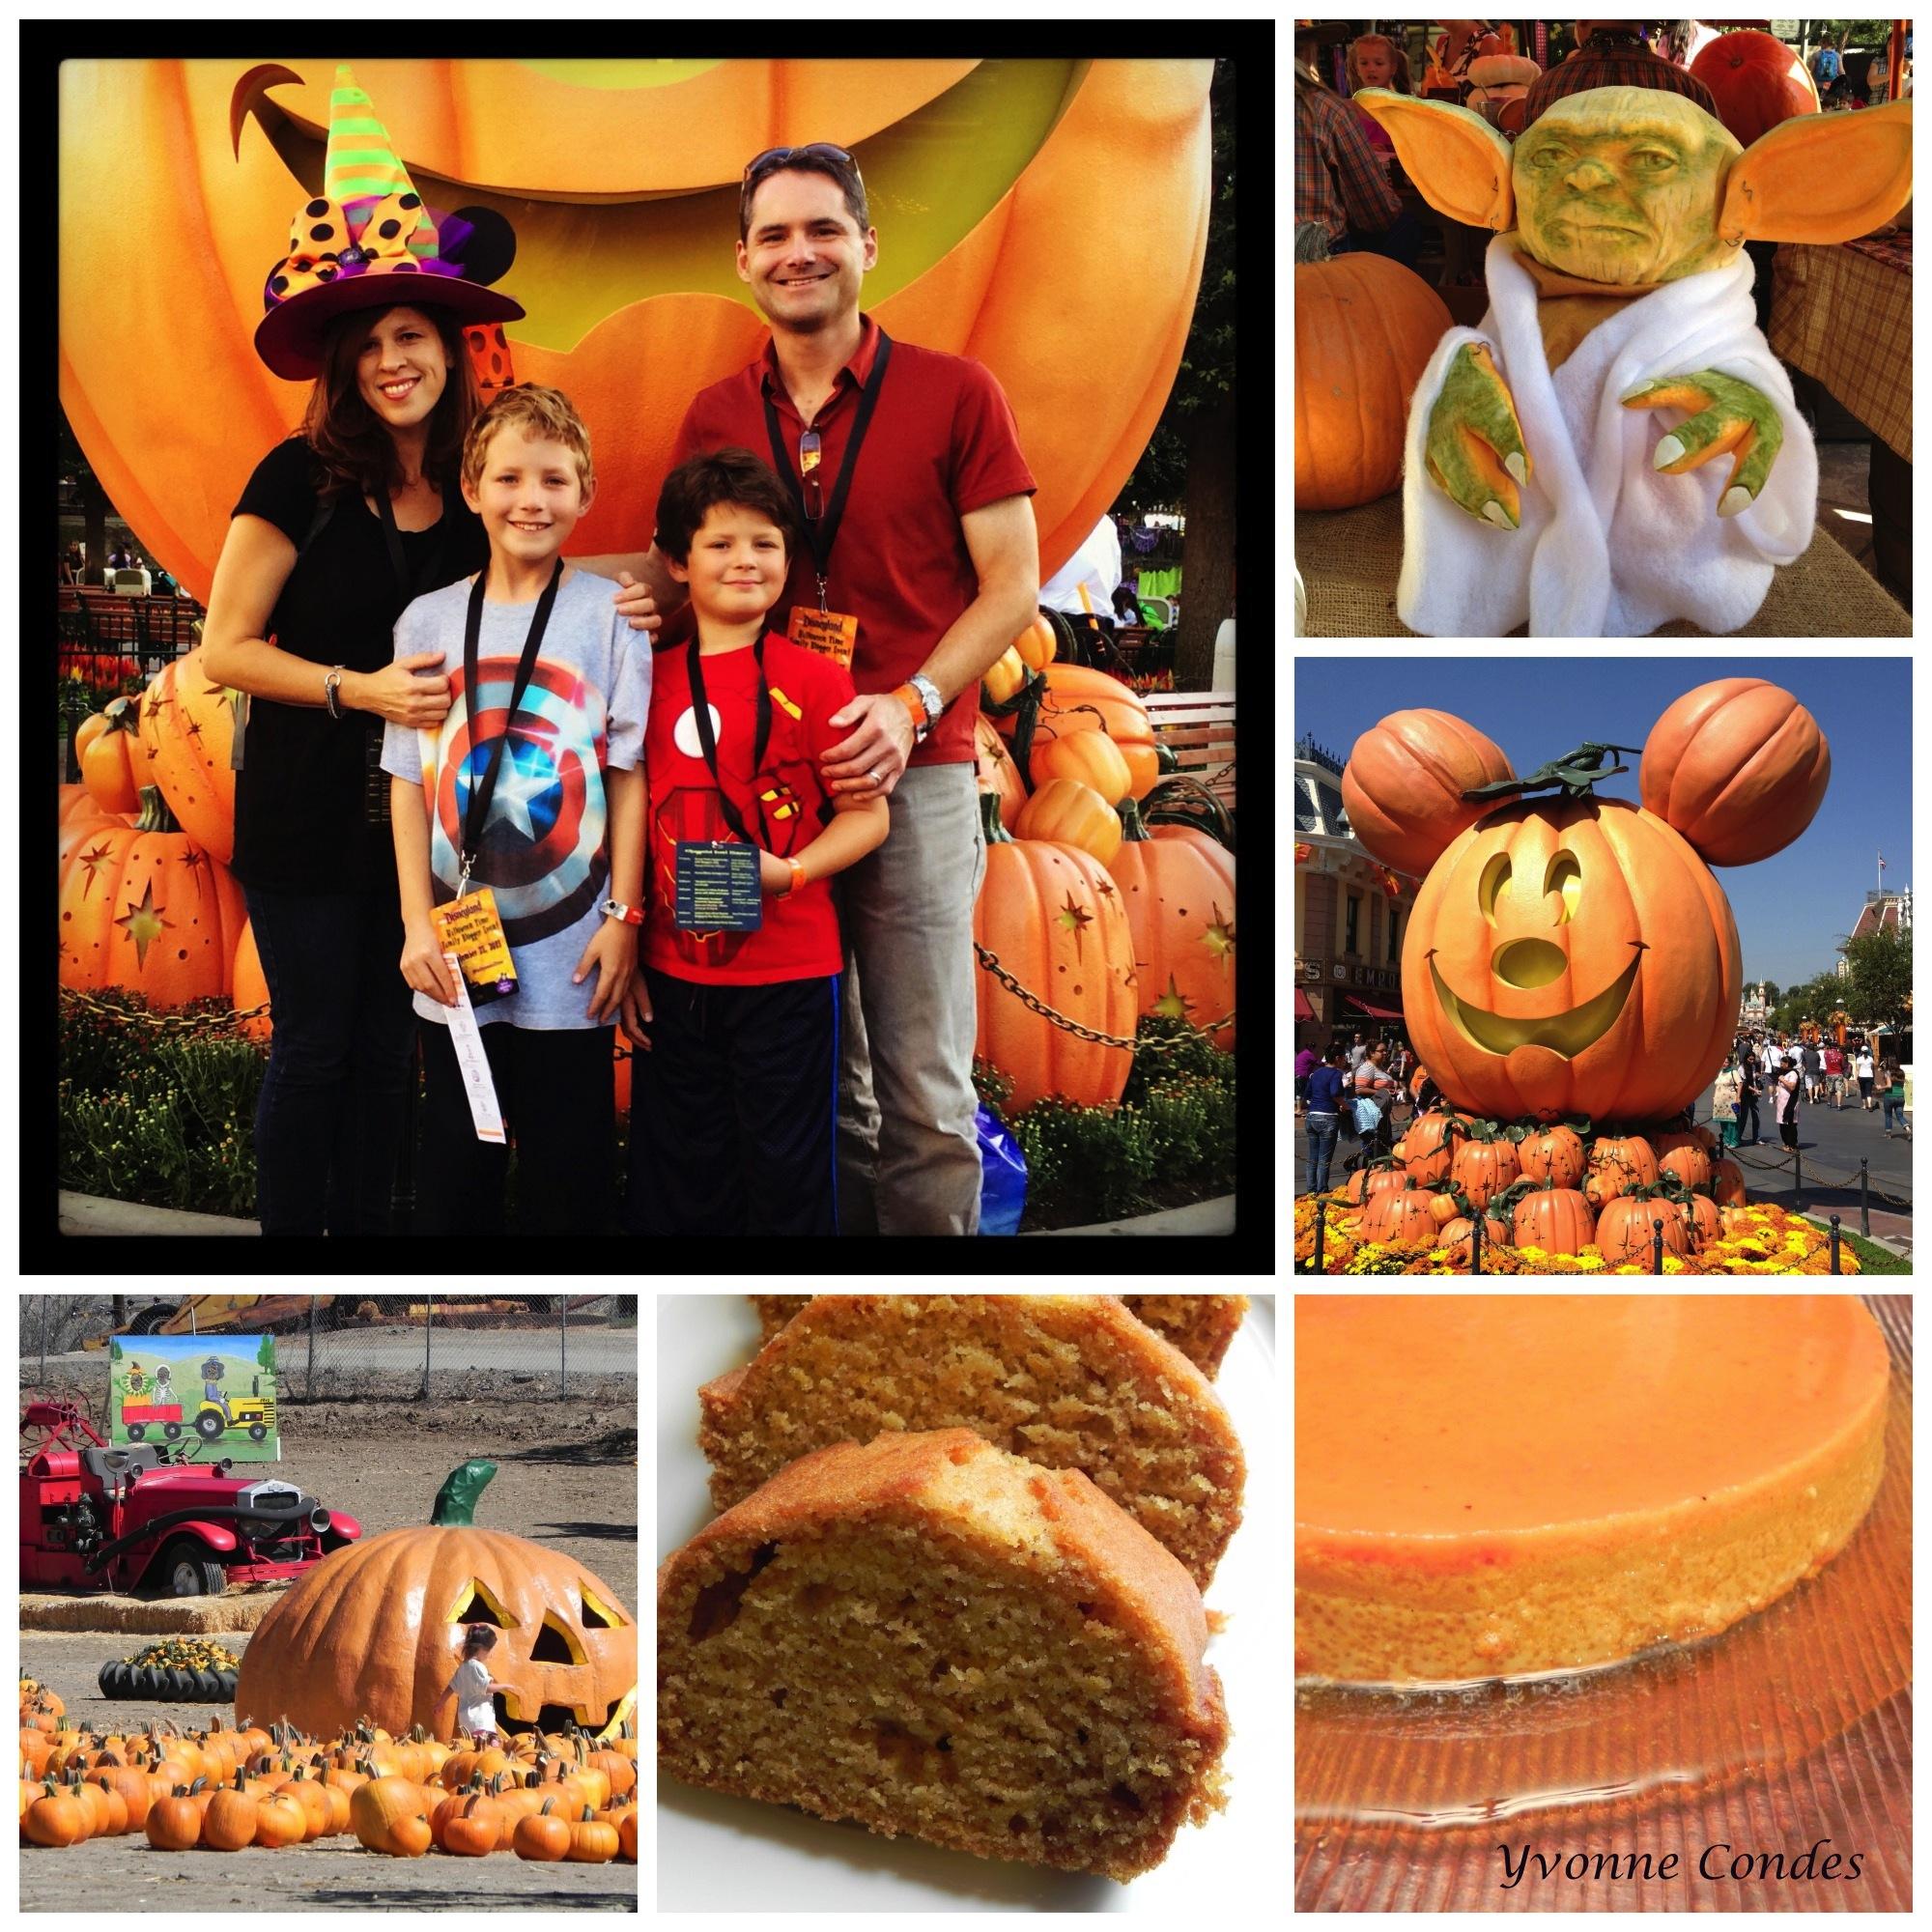 Pumpkin photos (by Yvonne Condes)